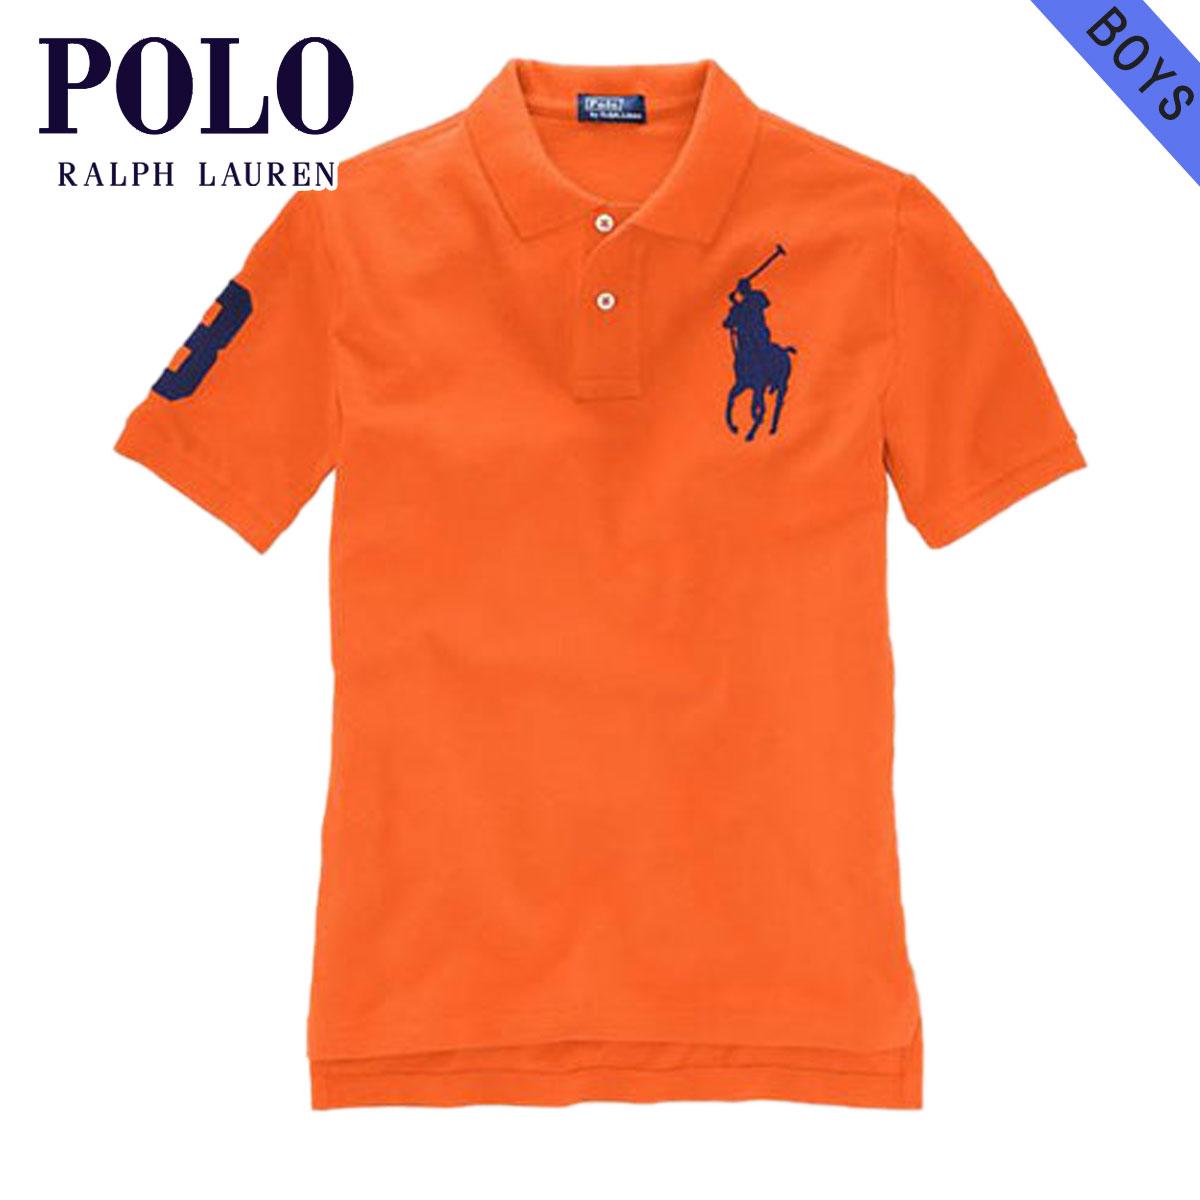 Poloralflorenkids POLO RALPH LAUREN CHILDREN genuine kids clothing boys Polo  Shirt Big Pony Polo Shirt #